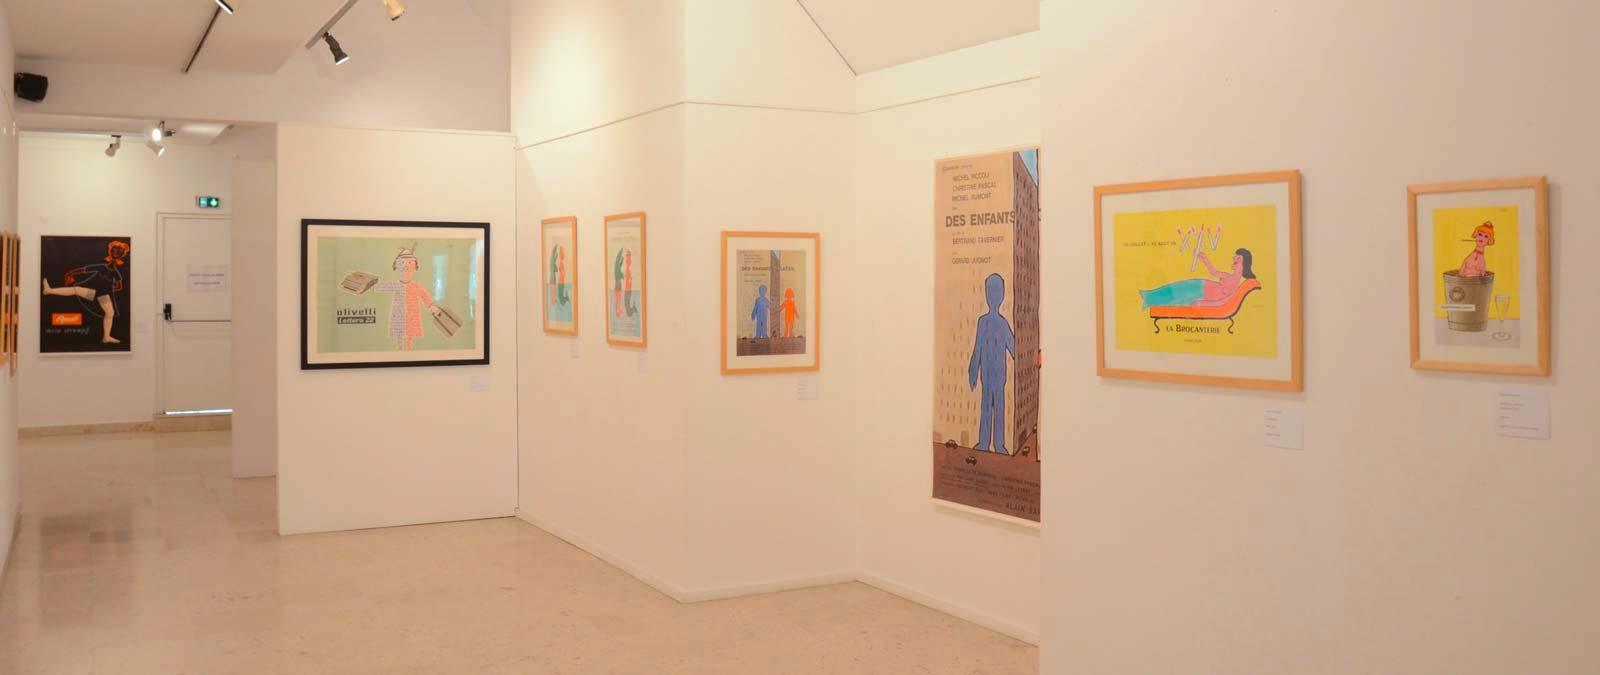 Raymond Savignac musée Trouville-sur-Mer